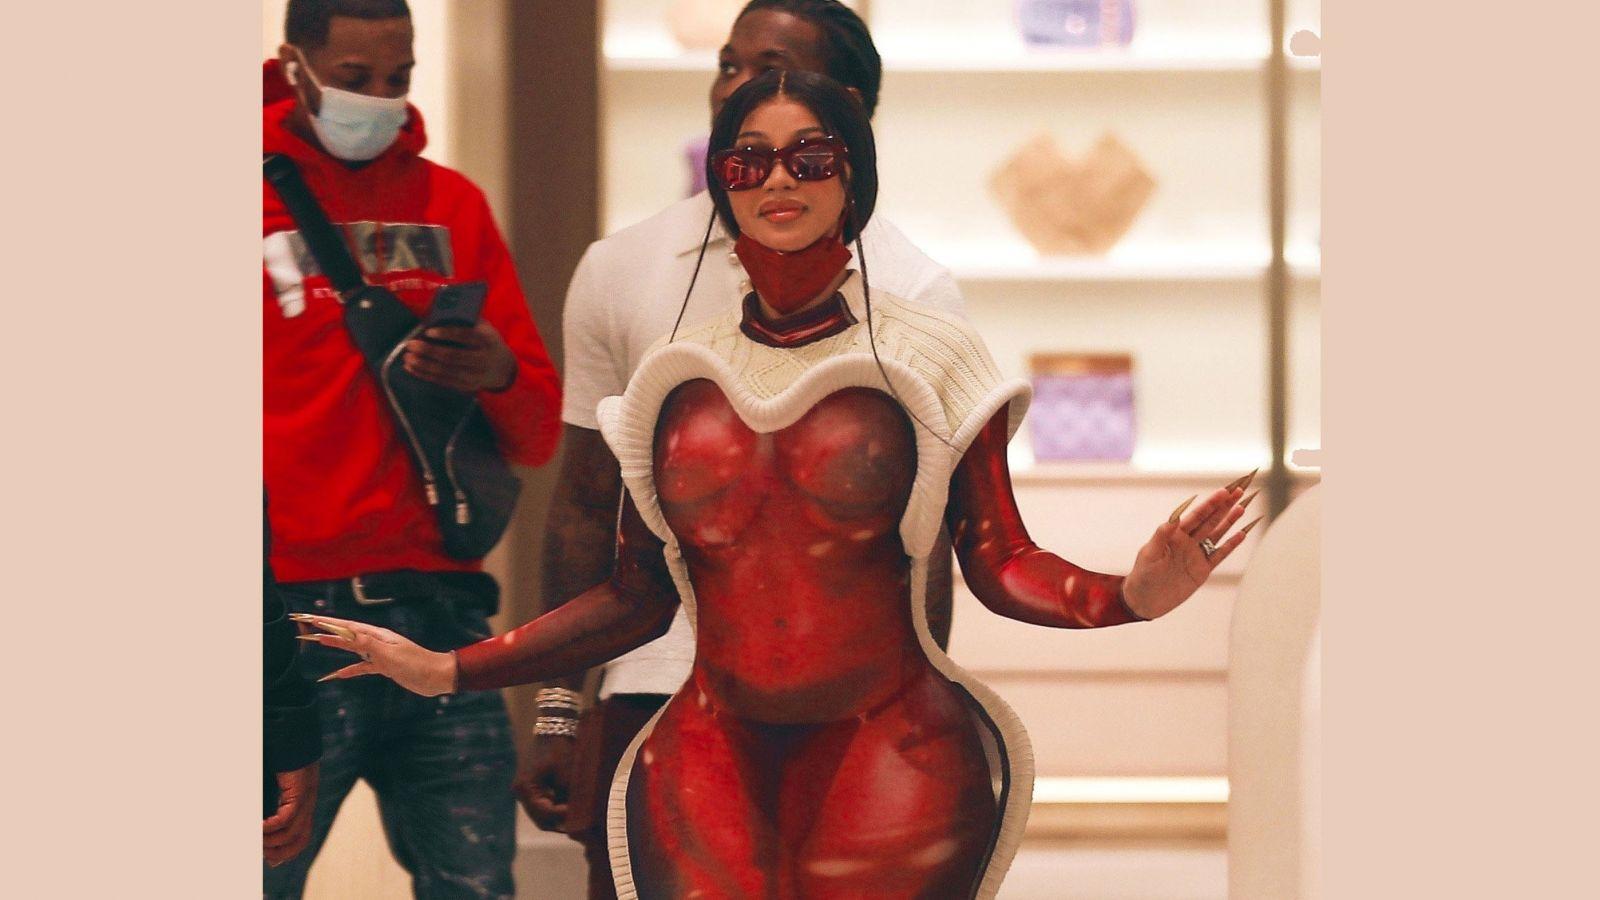 Cardi B: Αν δεν έχεις δει το ημιδιάφανο φόρεμα που έβαλε για ψώνια δεν έχεις δει τίποτα [pics]